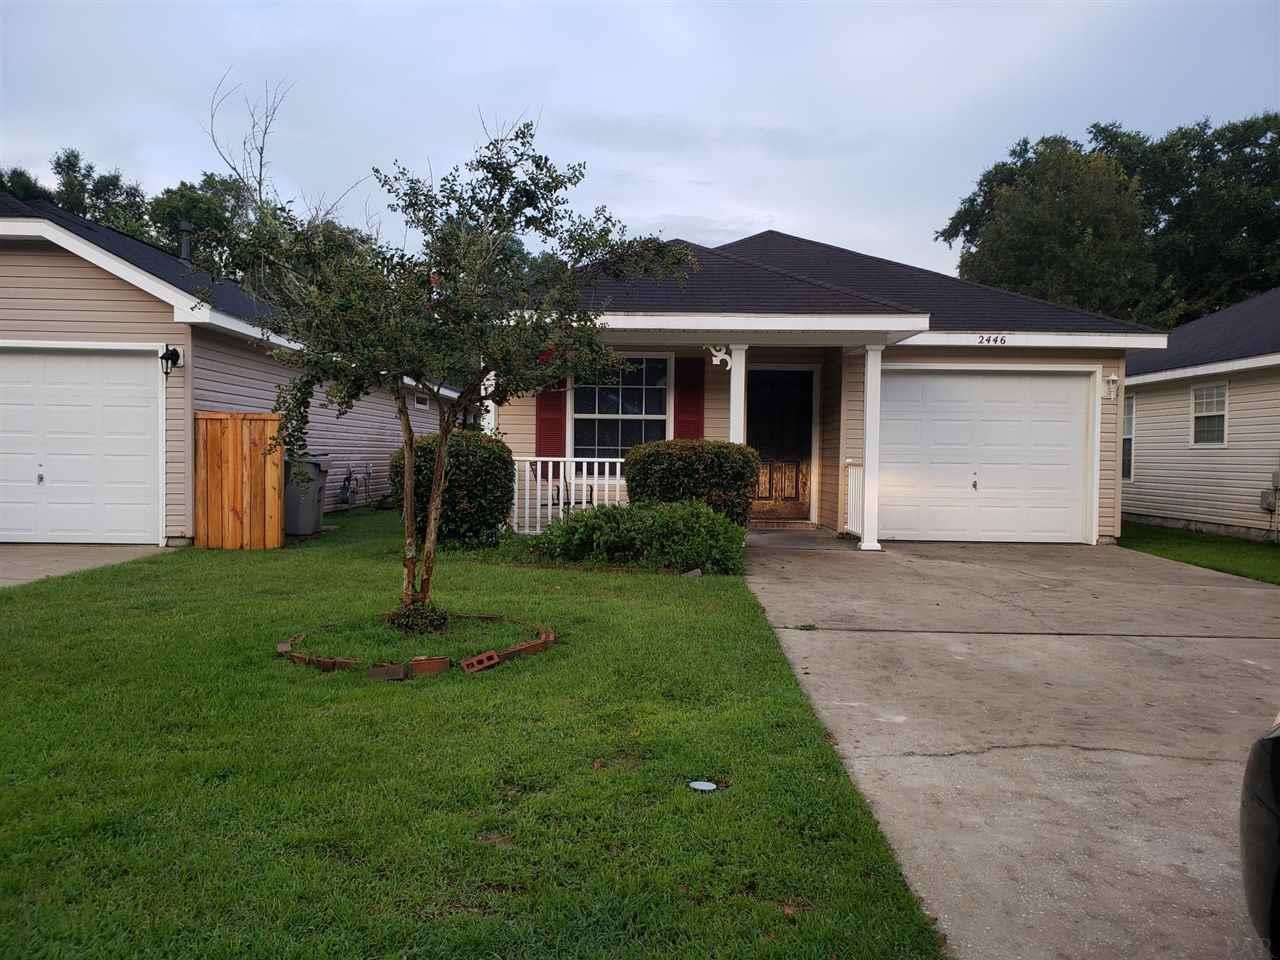 2446 Trailwood Dr, Cantonment, FL 32533